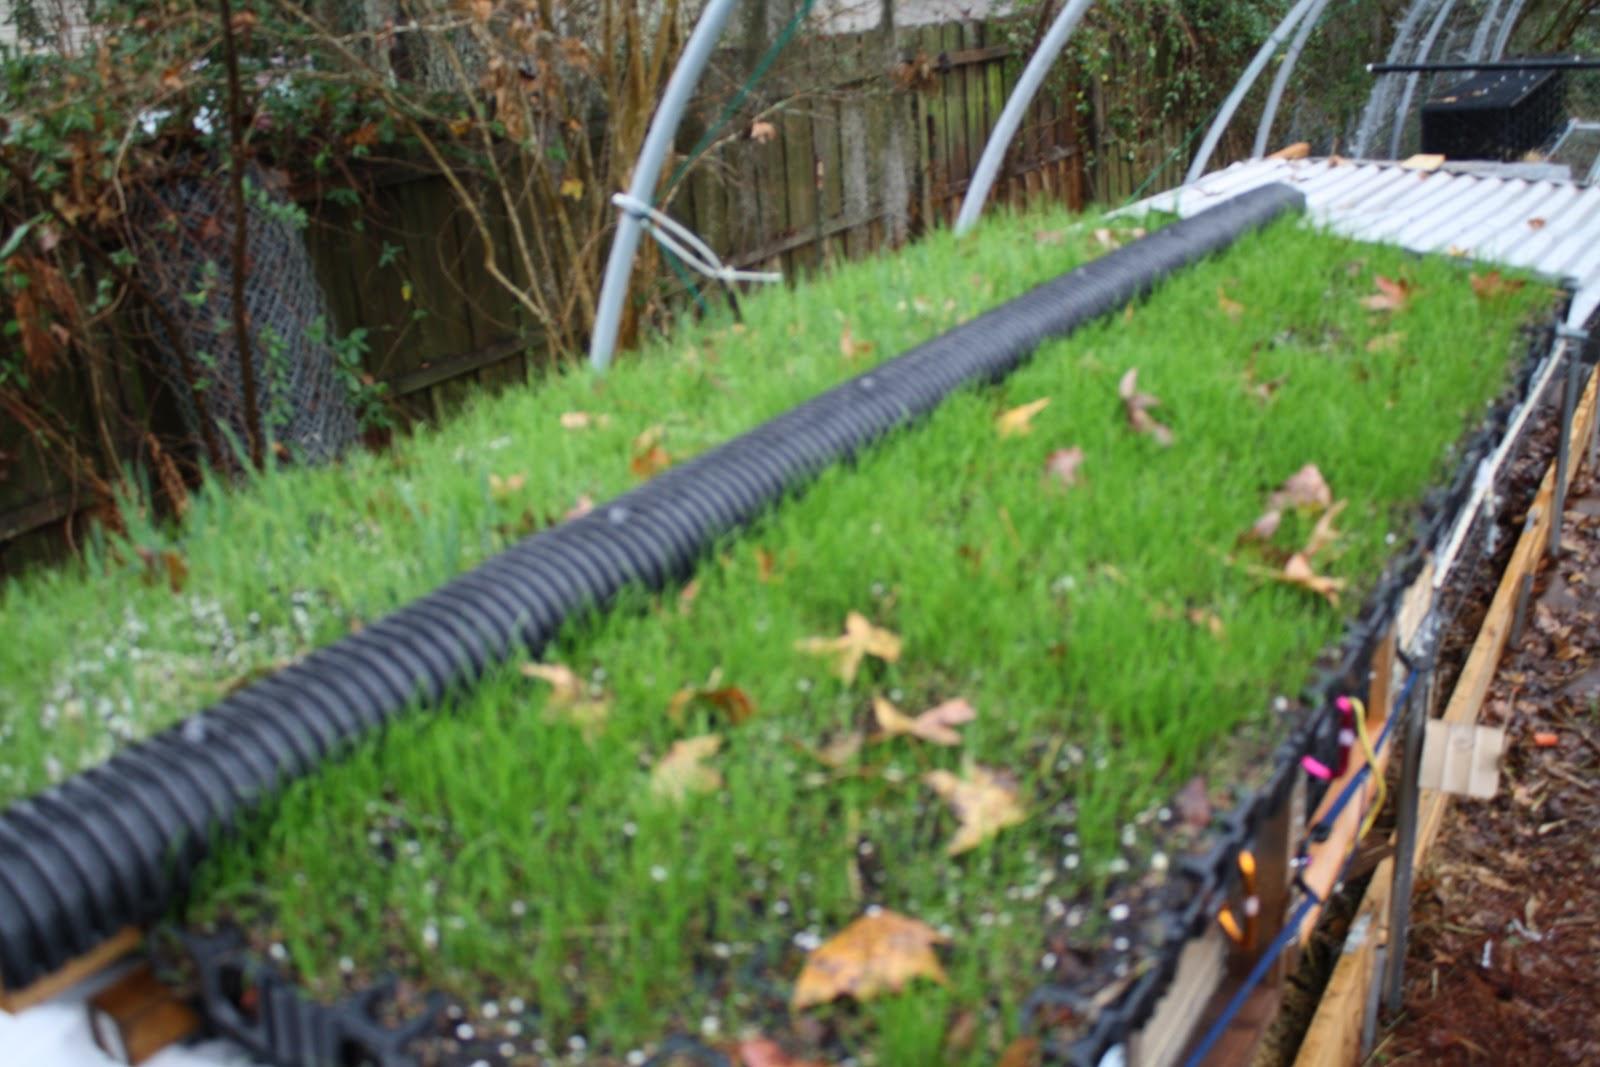 kevin songer rabbit on a stick green roofs fresh. Black Bedroom Furniture Sets. Home Design Ideas